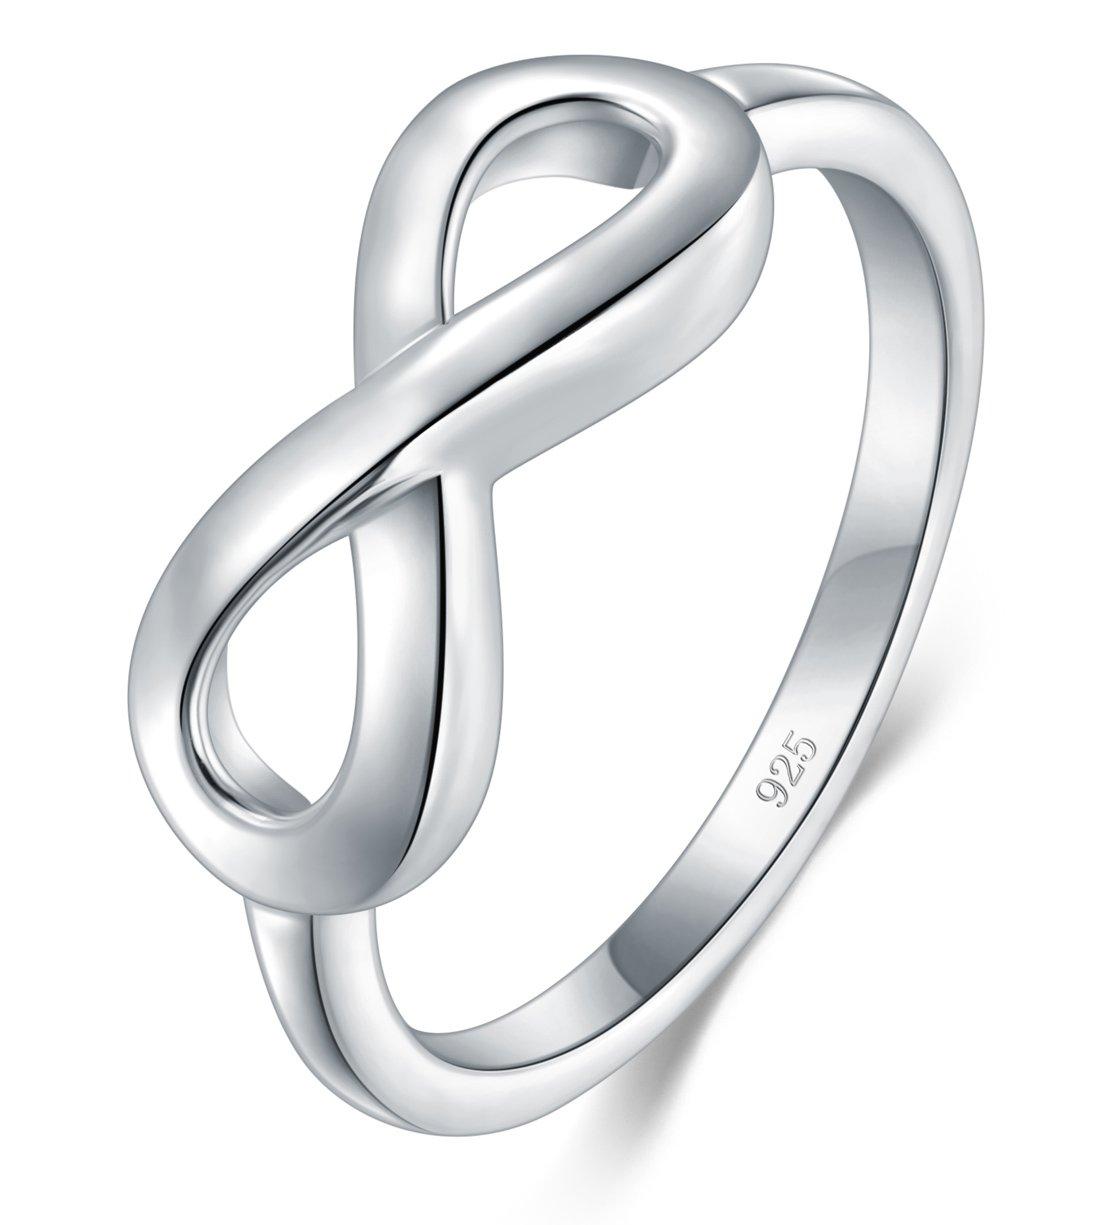 1482958f5 BORUO 925 Sterling Silver Ring High Polish Infinity Symbol Tarnish  Resistant Comfort Fit Wedding Band Ring